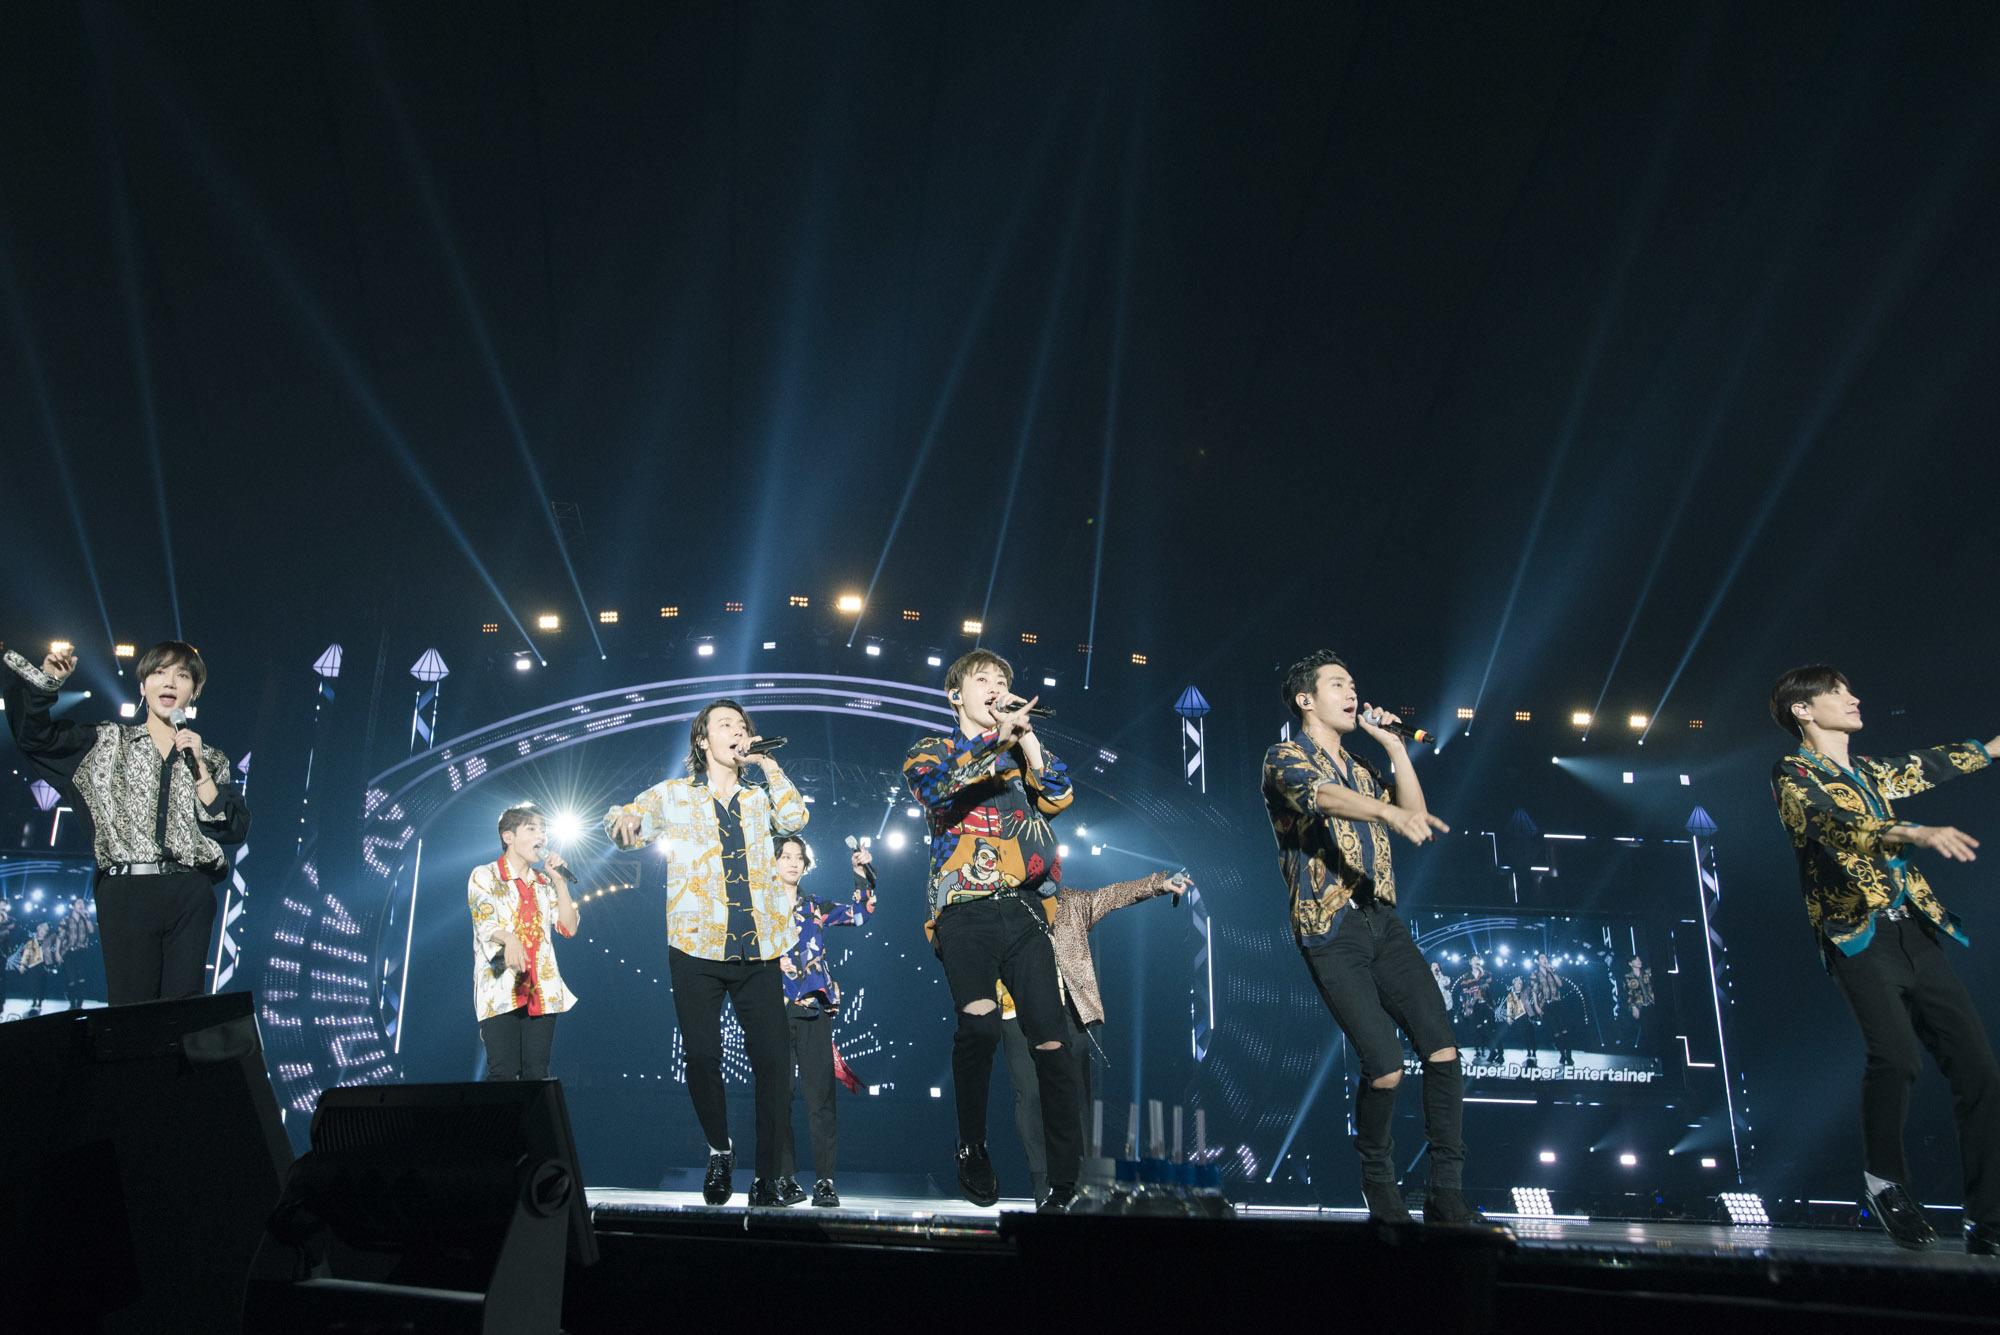 SUPER JUNIORが日本公演で10万人を動員 全28曲を全力